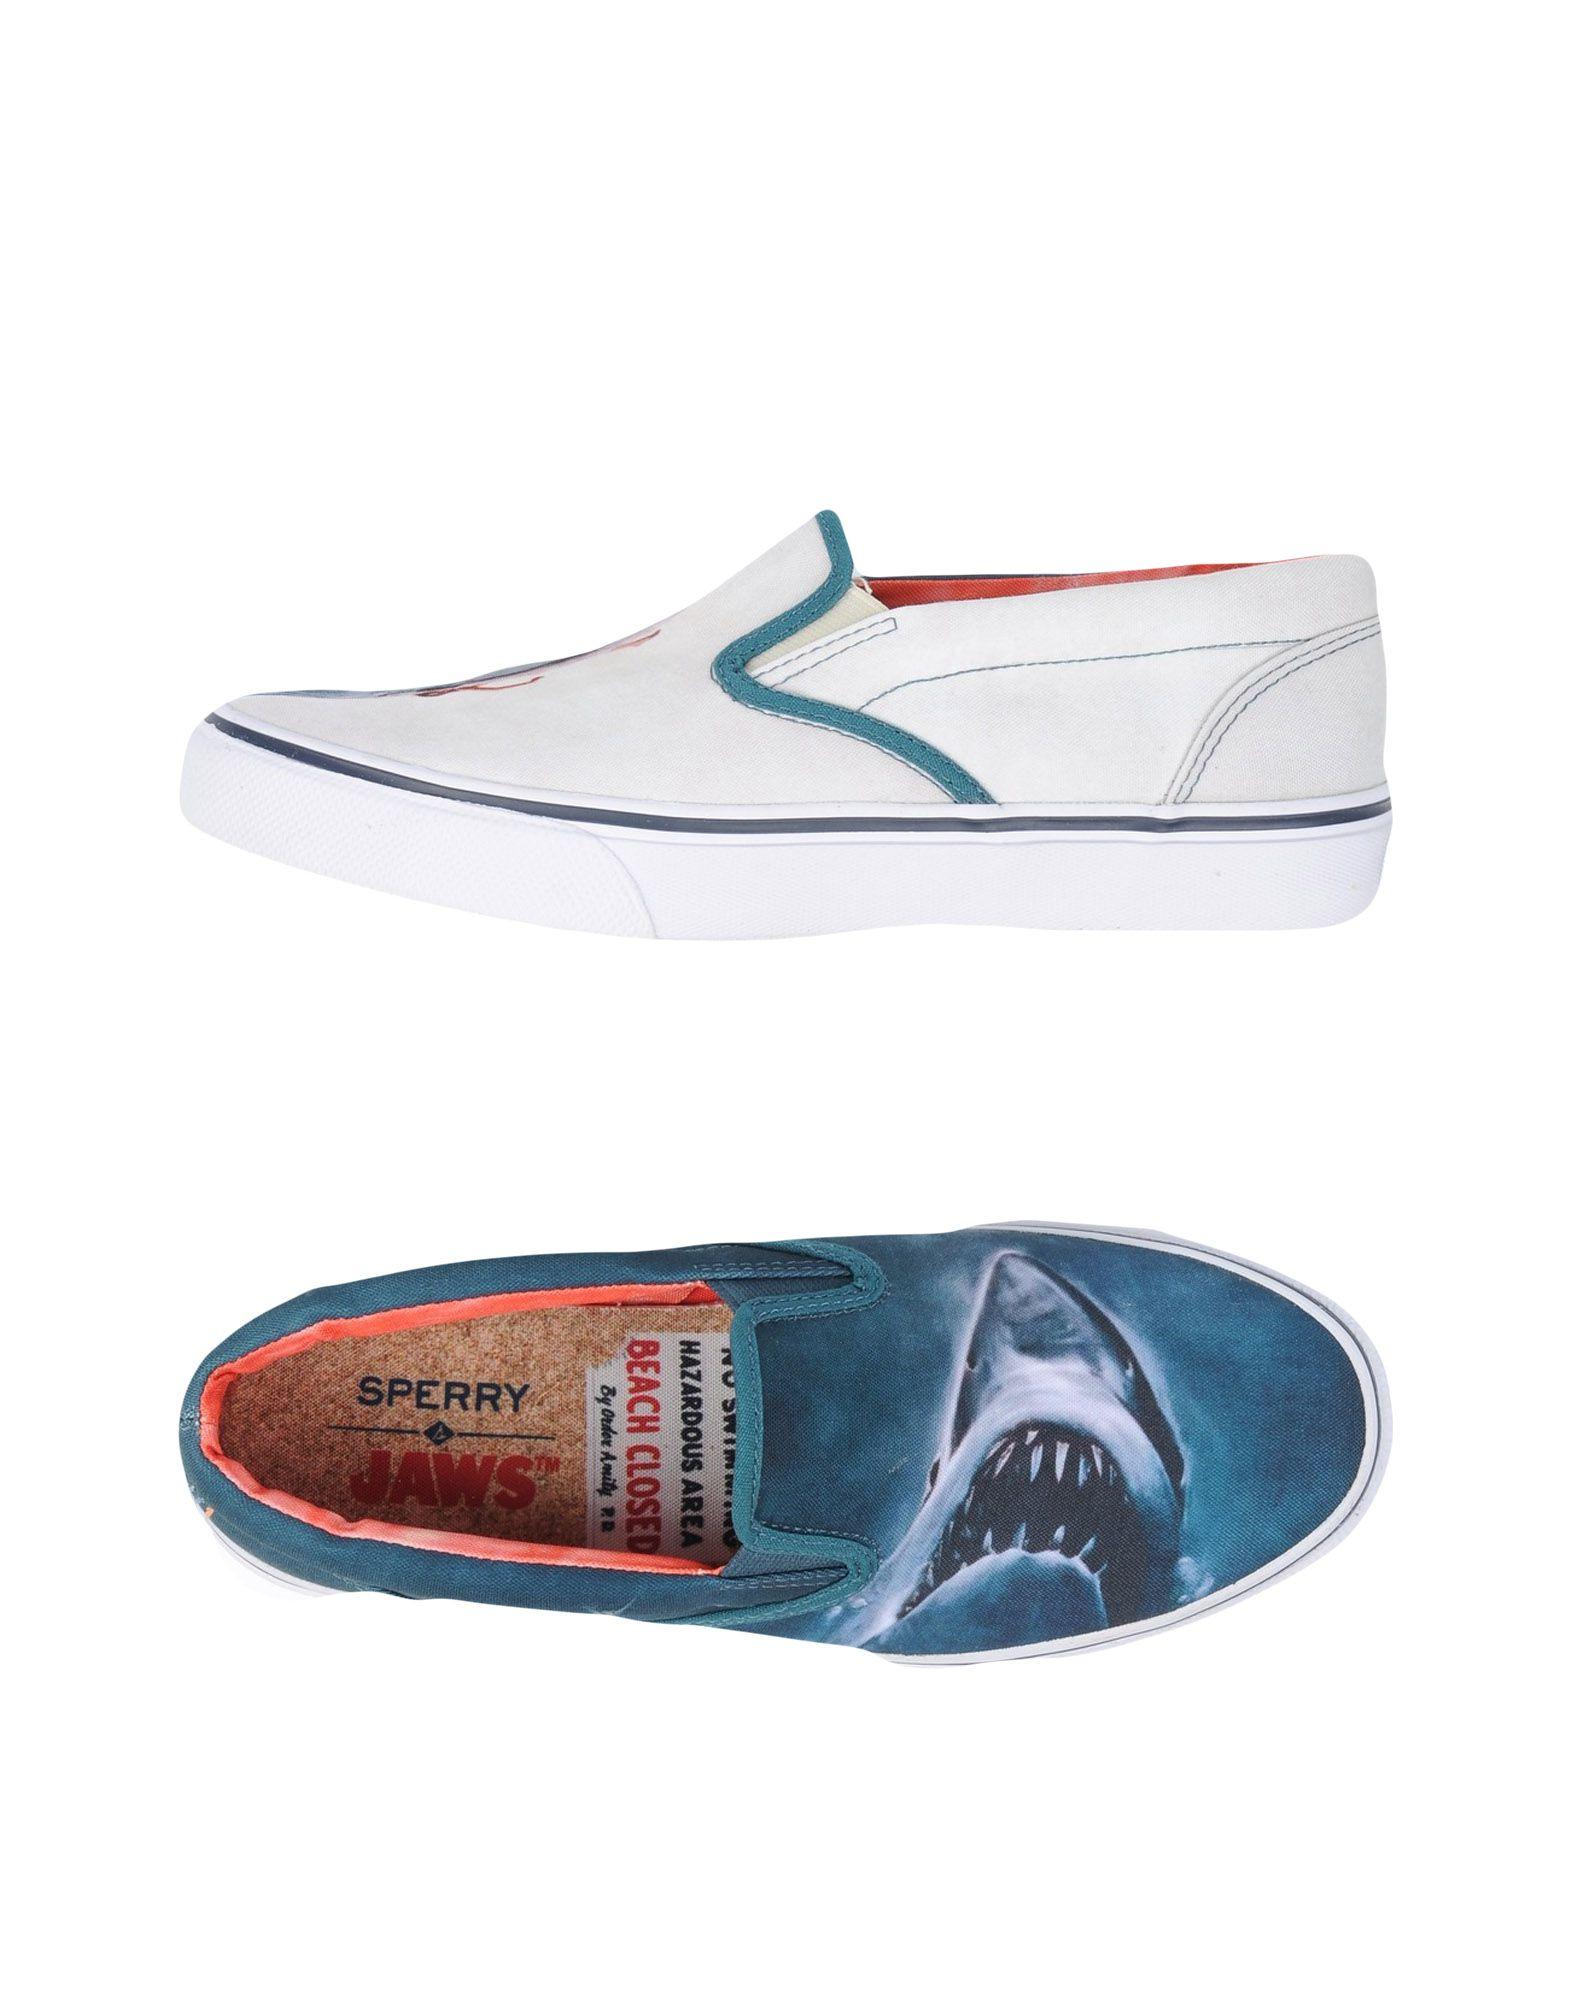 Sneakers Sperry Homme - Sneakers Sperry sur